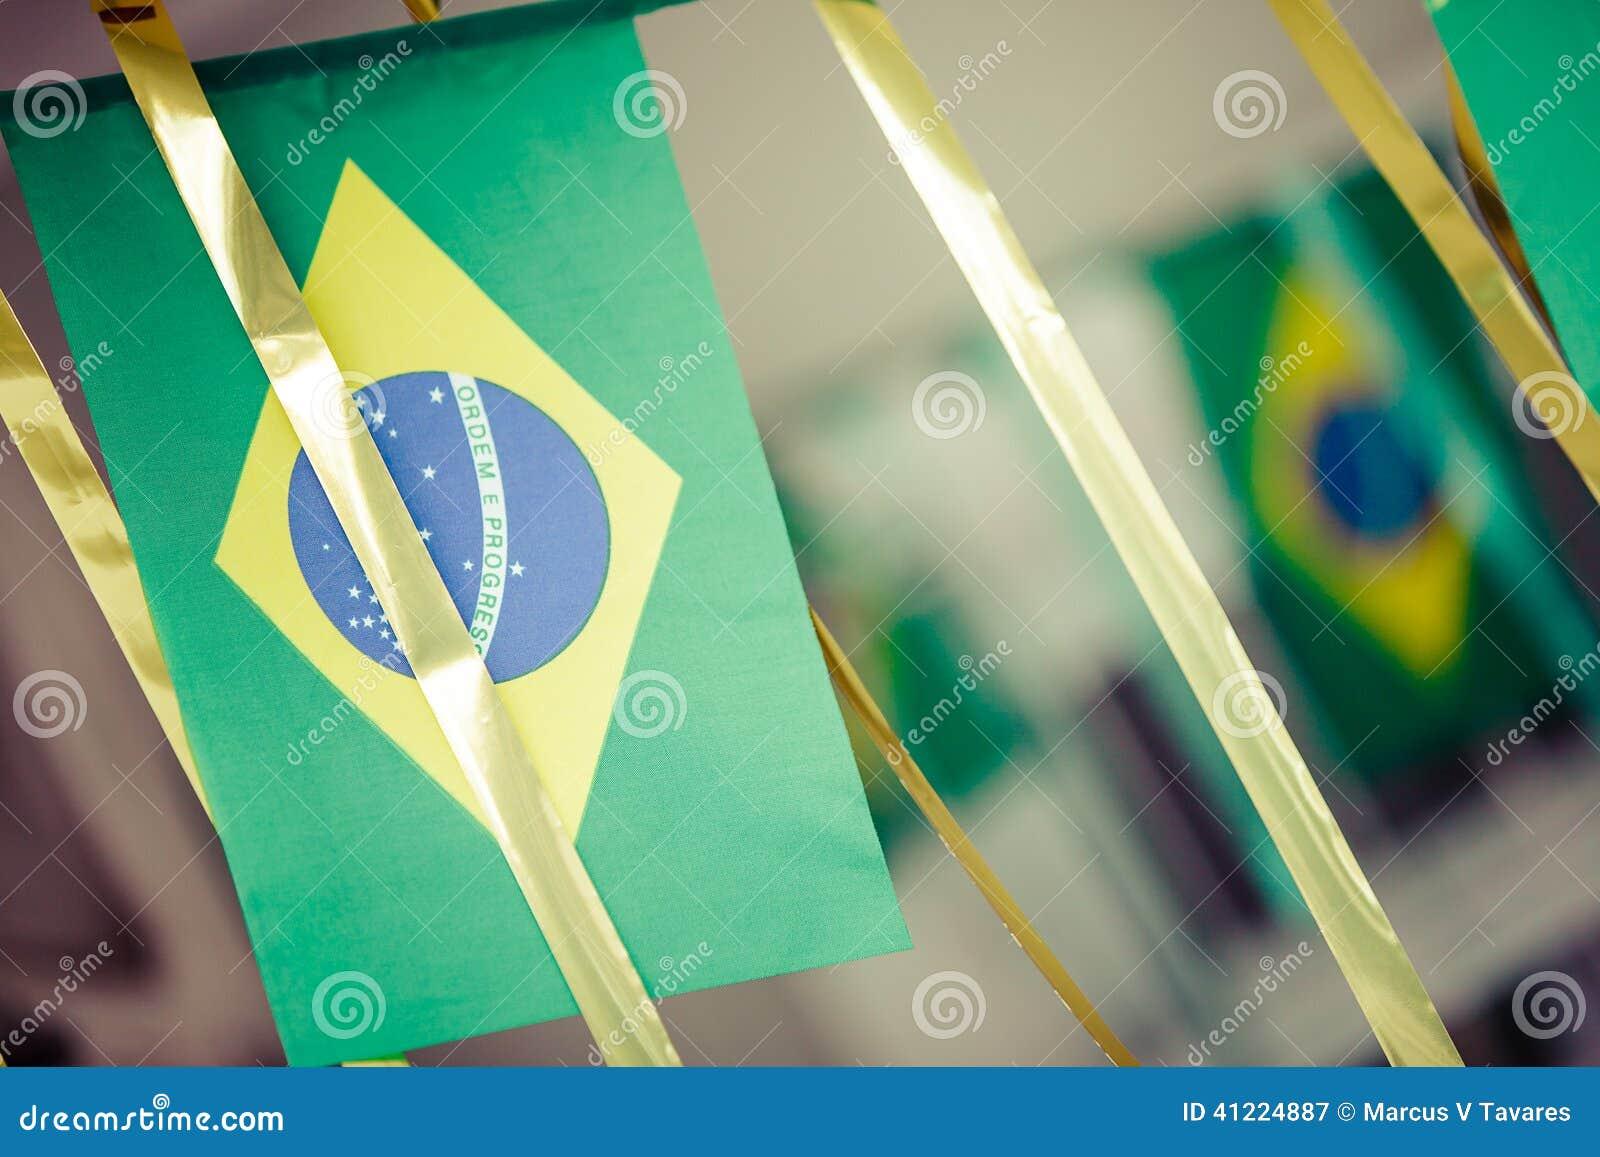 Hrm in brazil an interview